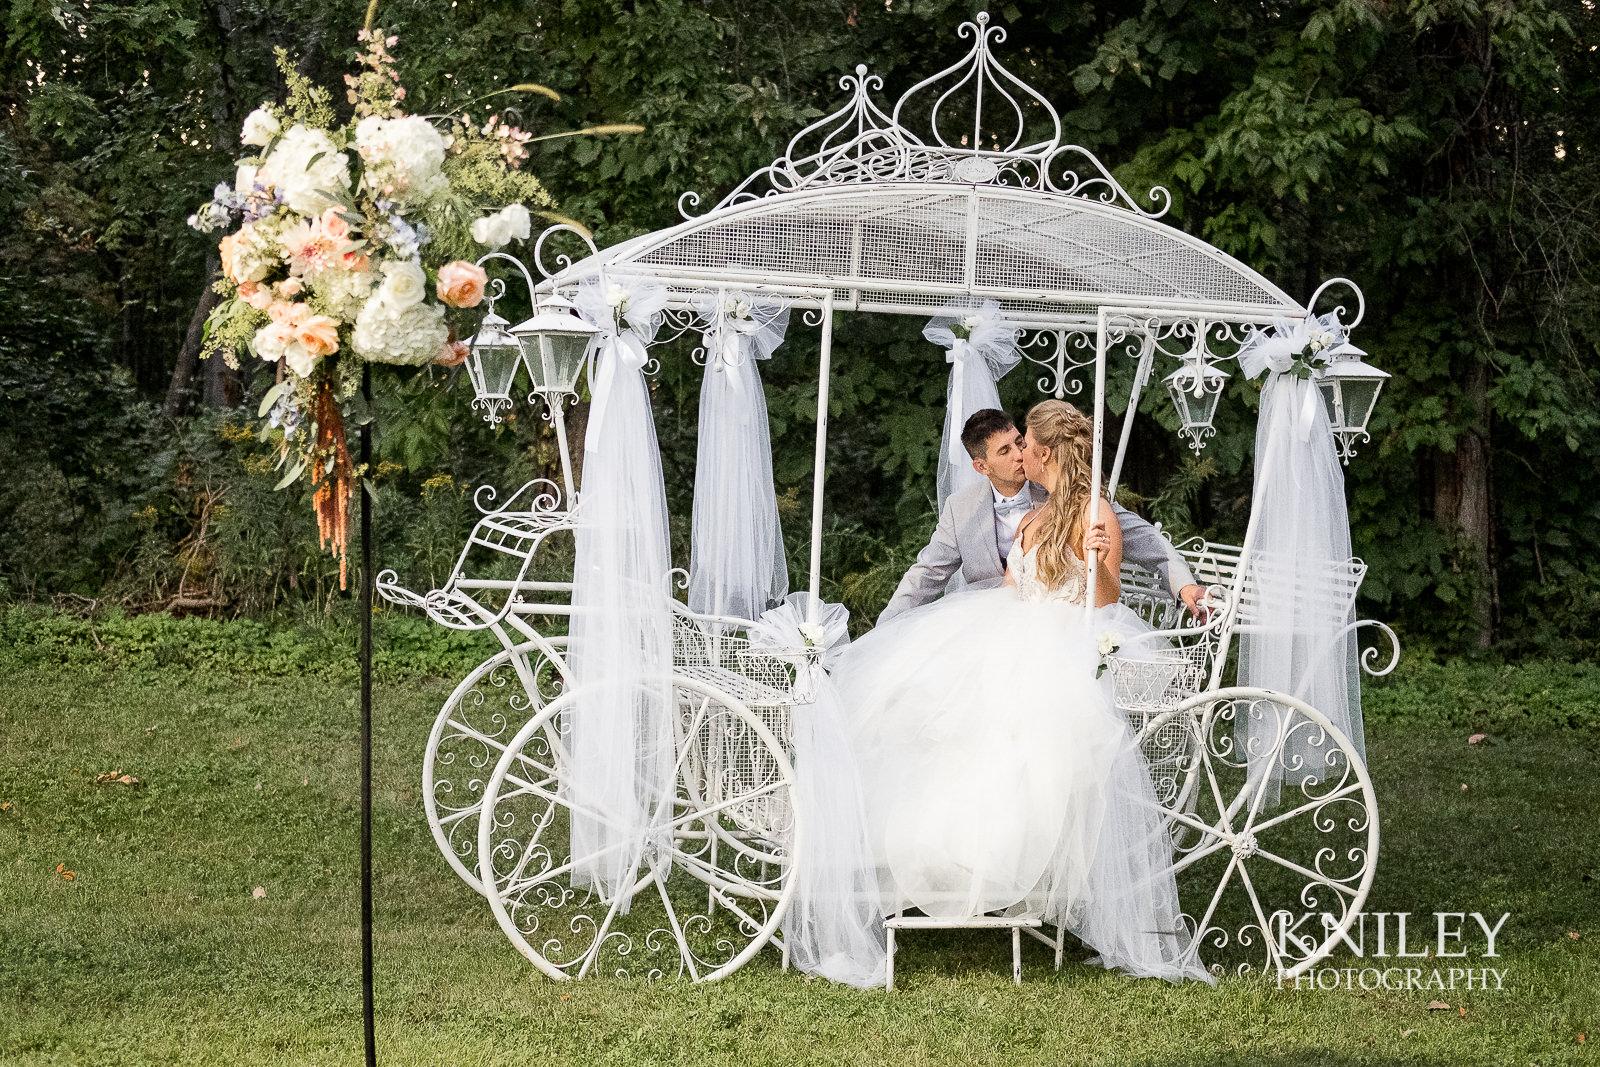 103 - Buffalo NY wedding pictures - Sean Patrick Restaurant Wedding Reception - Getzville - XT2A7442.jpg